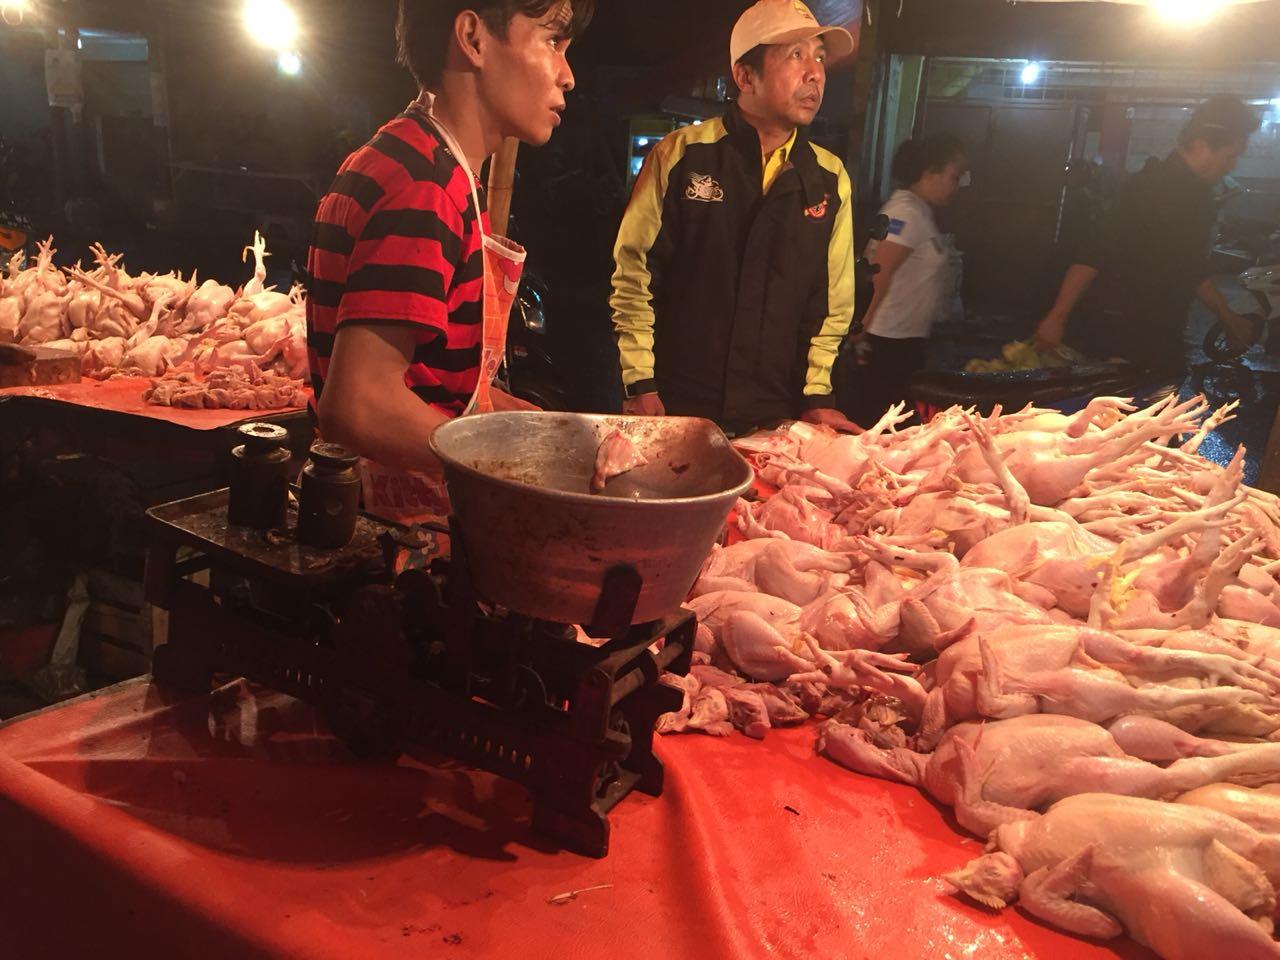 https: img-o.okeinfo.net content 2018 06 14 320 1910371 besok-lebaran-harga-daging-ayam-meroket-jadi-rp50-000-kg-uY4zFOKuhR.jpg